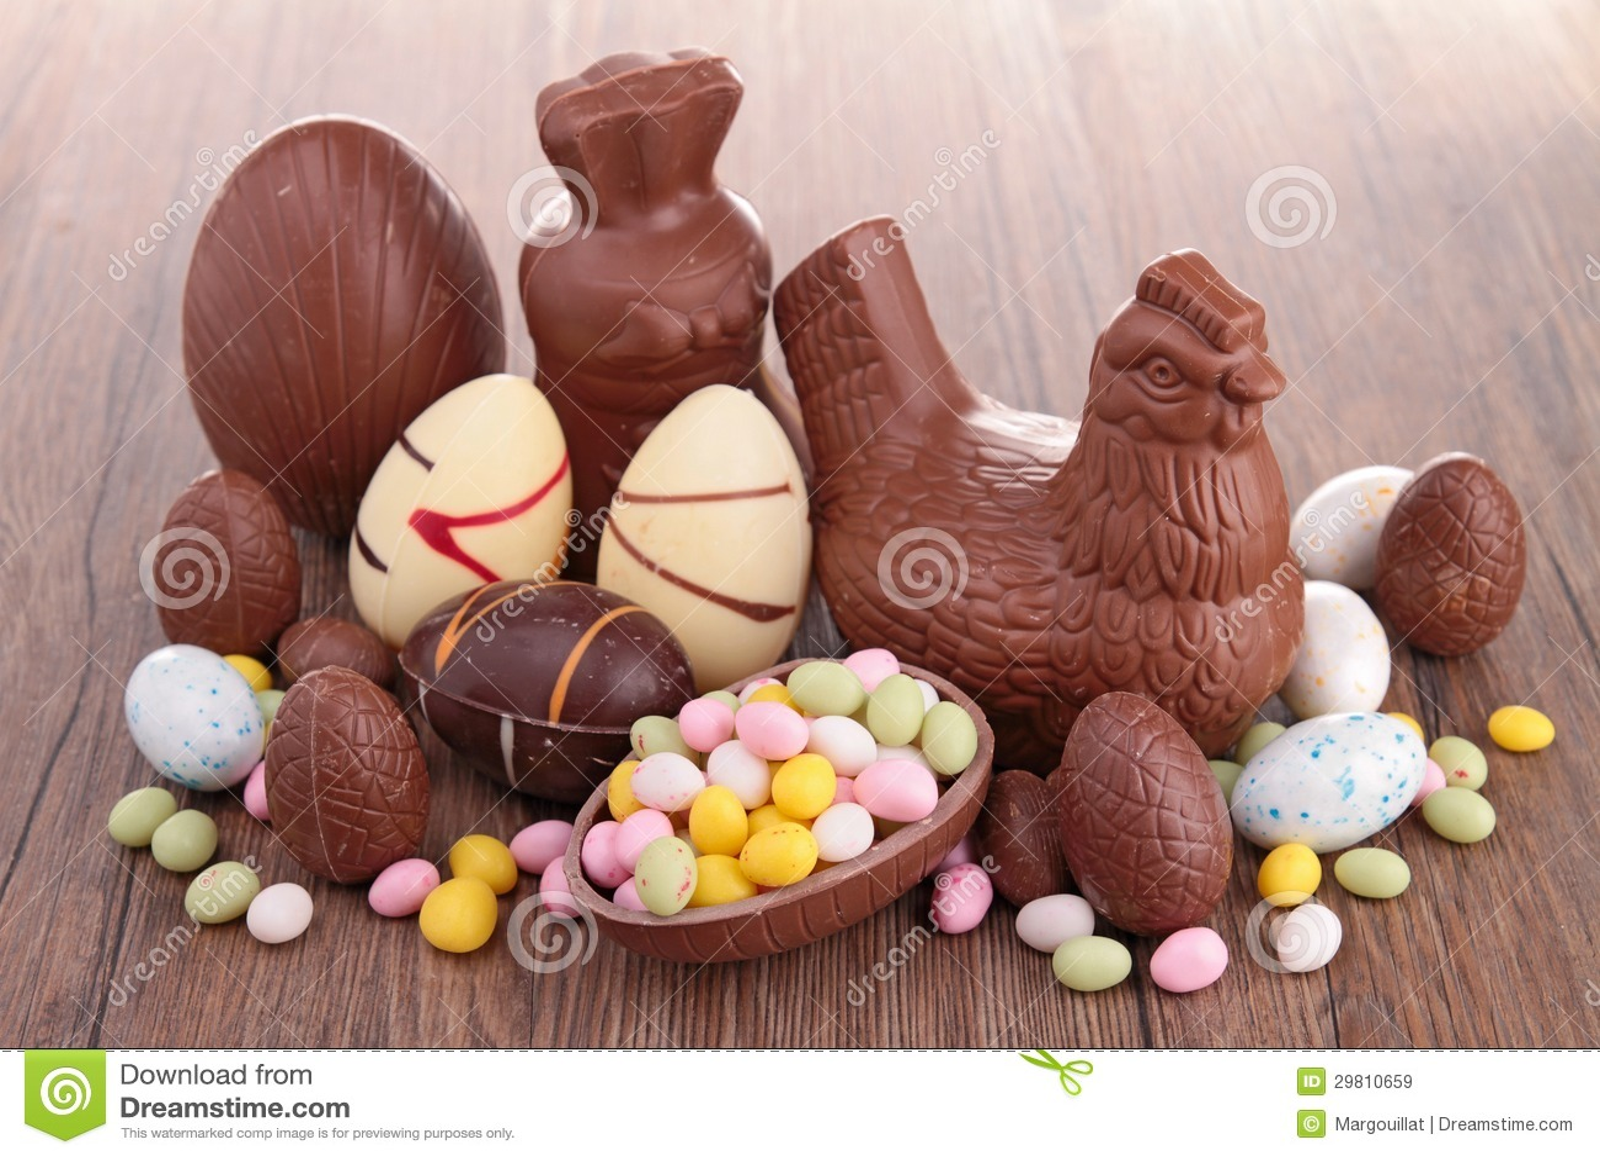 chocolats de p ques images libres de droits image 29810659. Black Bedroom Furniture Sets. Home Design Ideas